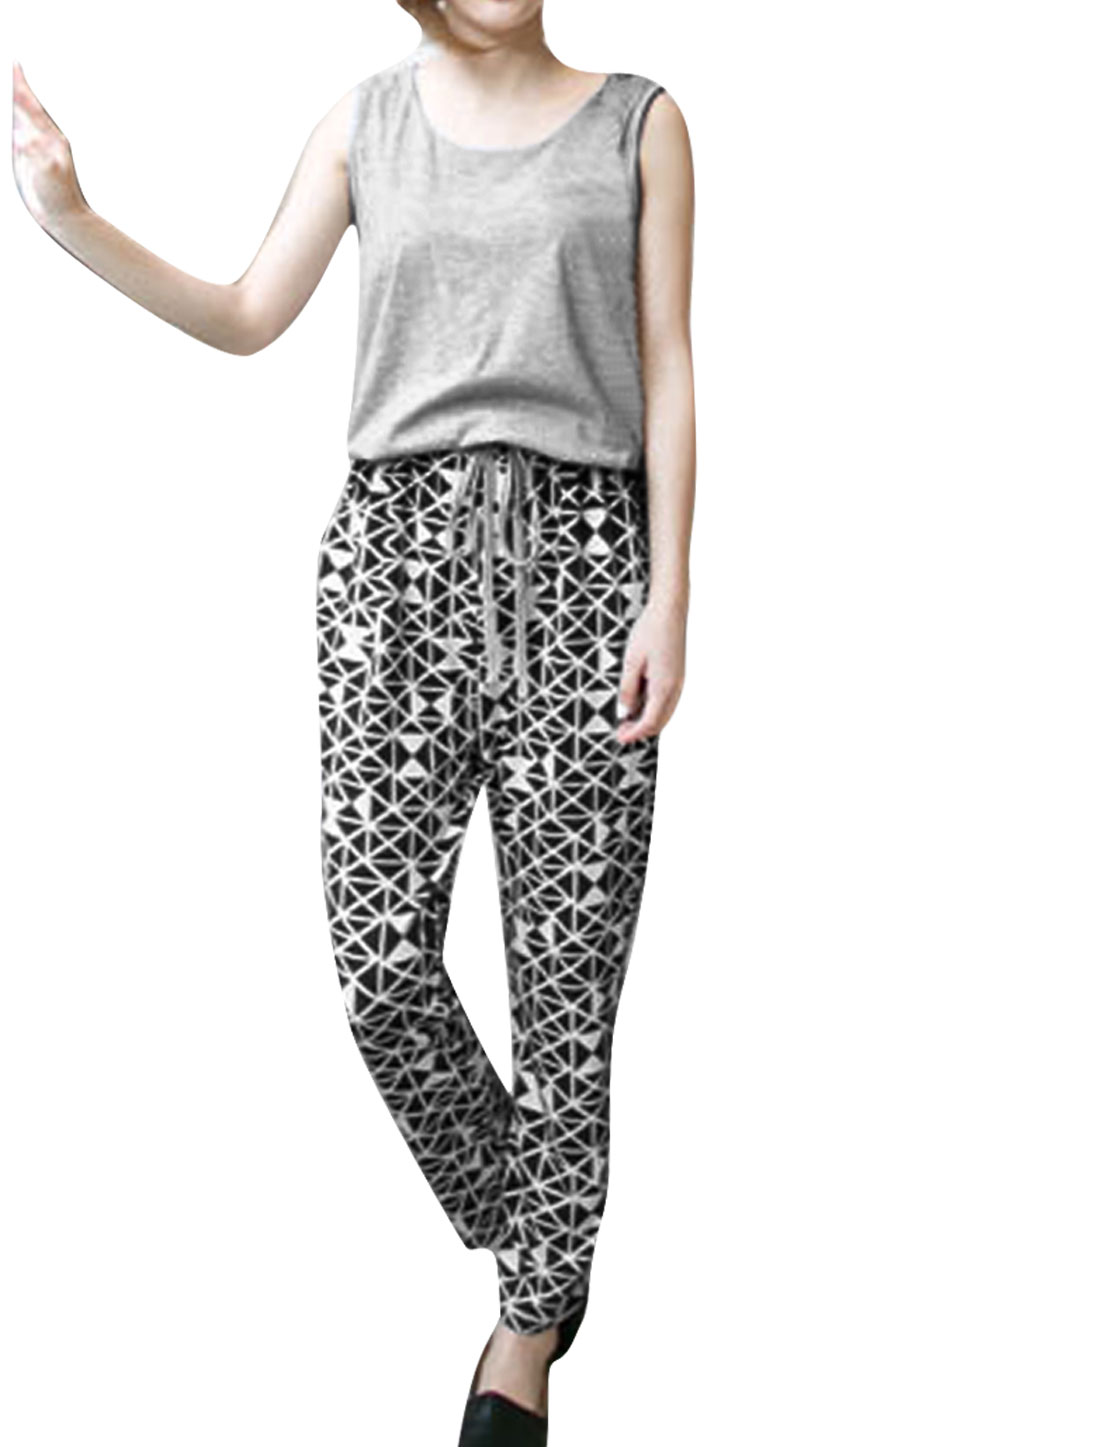 Women Round Neck Slant Pockets Sleeveless Design Jumpsuit Grey Black M